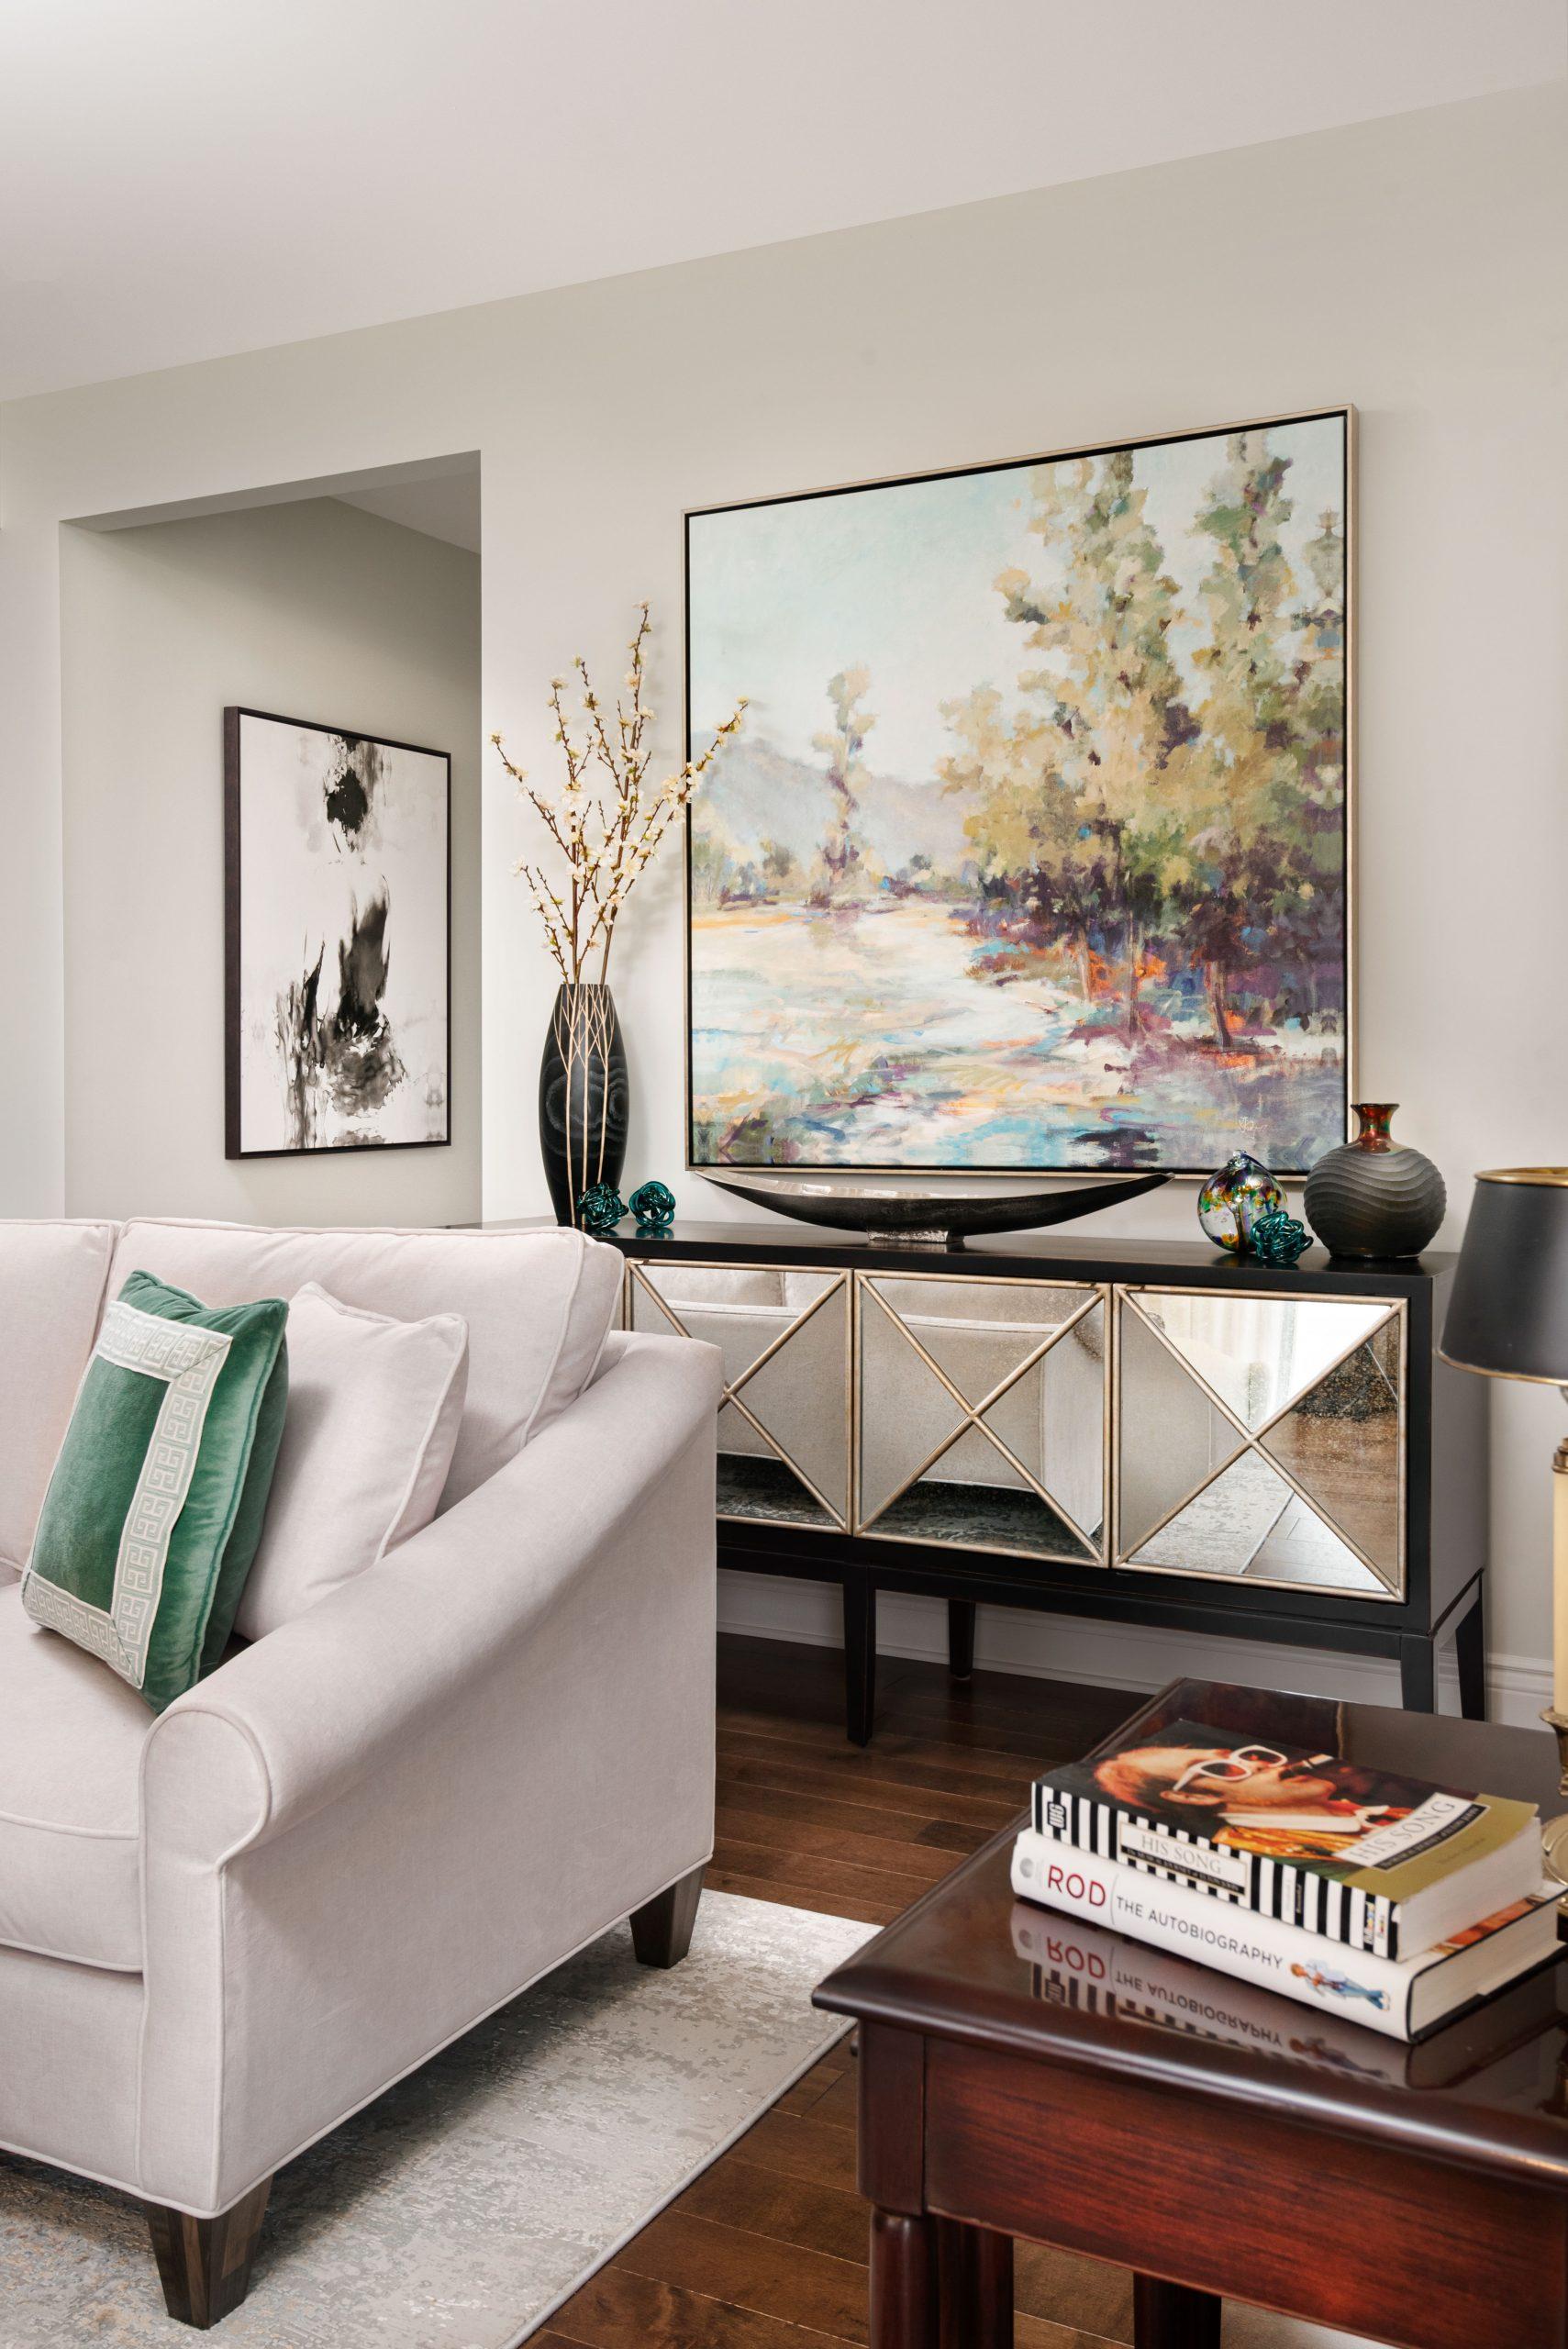 transitional living room sideboard, contemporary art, mirrored sideboard, sheridan interiors, interior designer cornwall, interior designer ottawa, sheridan interiors inc.